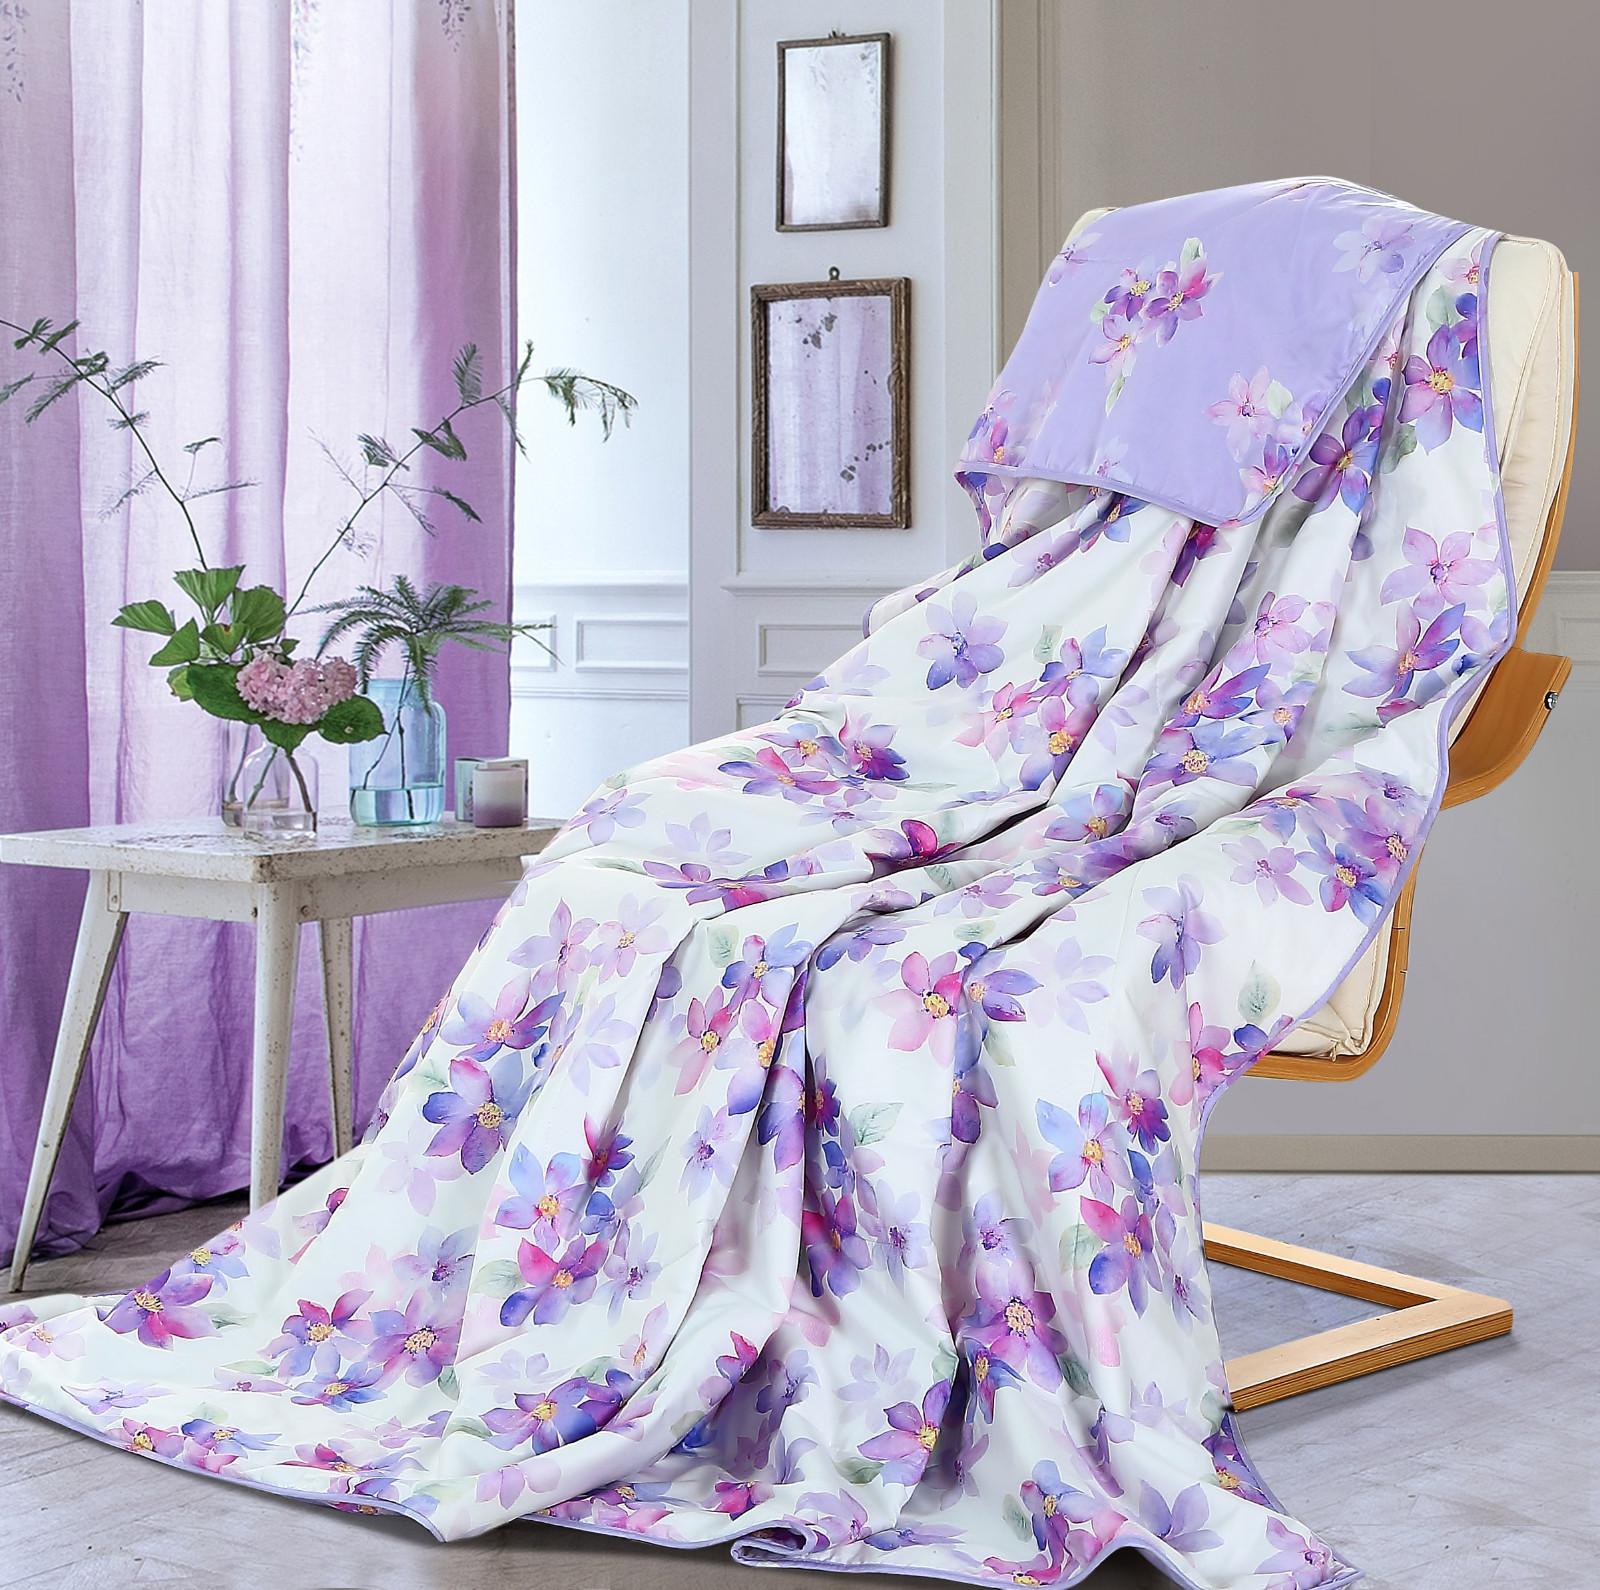 king size duvet sets comforter bamboo high Warranty Daphne